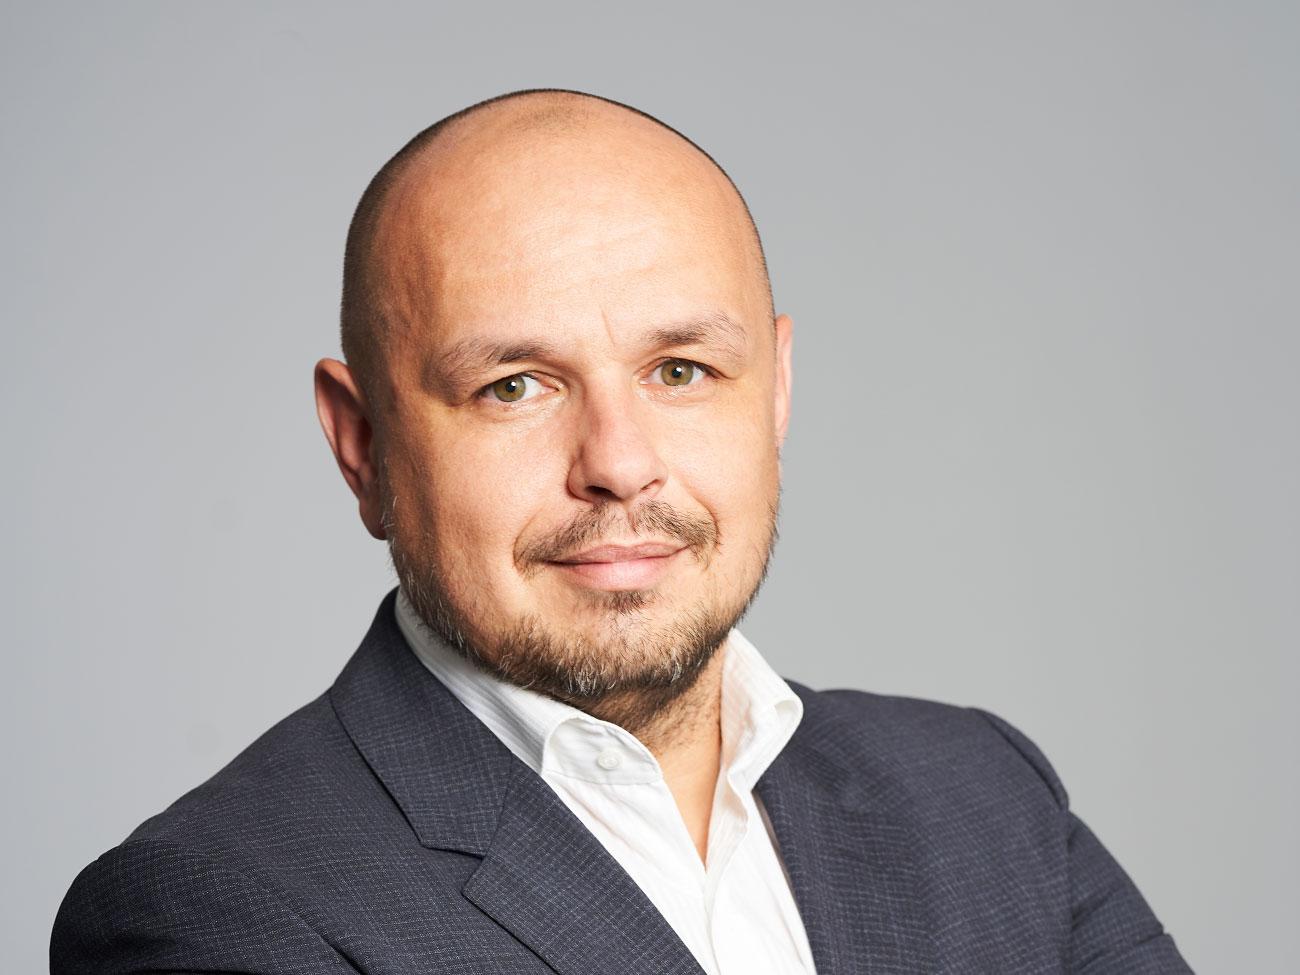 Bc. Daniel Dvorský